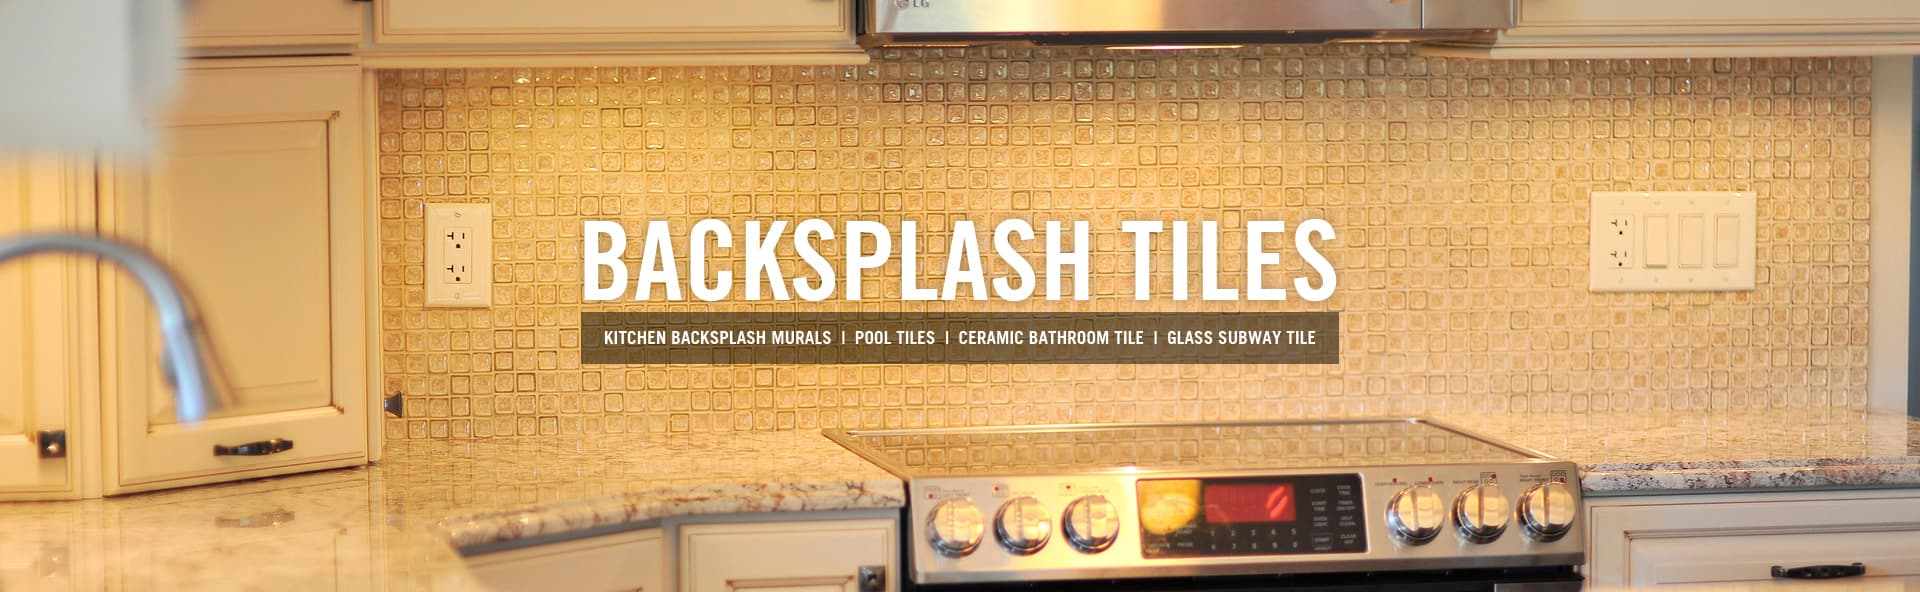 Backsplash tile, kitchen range/ stovetop